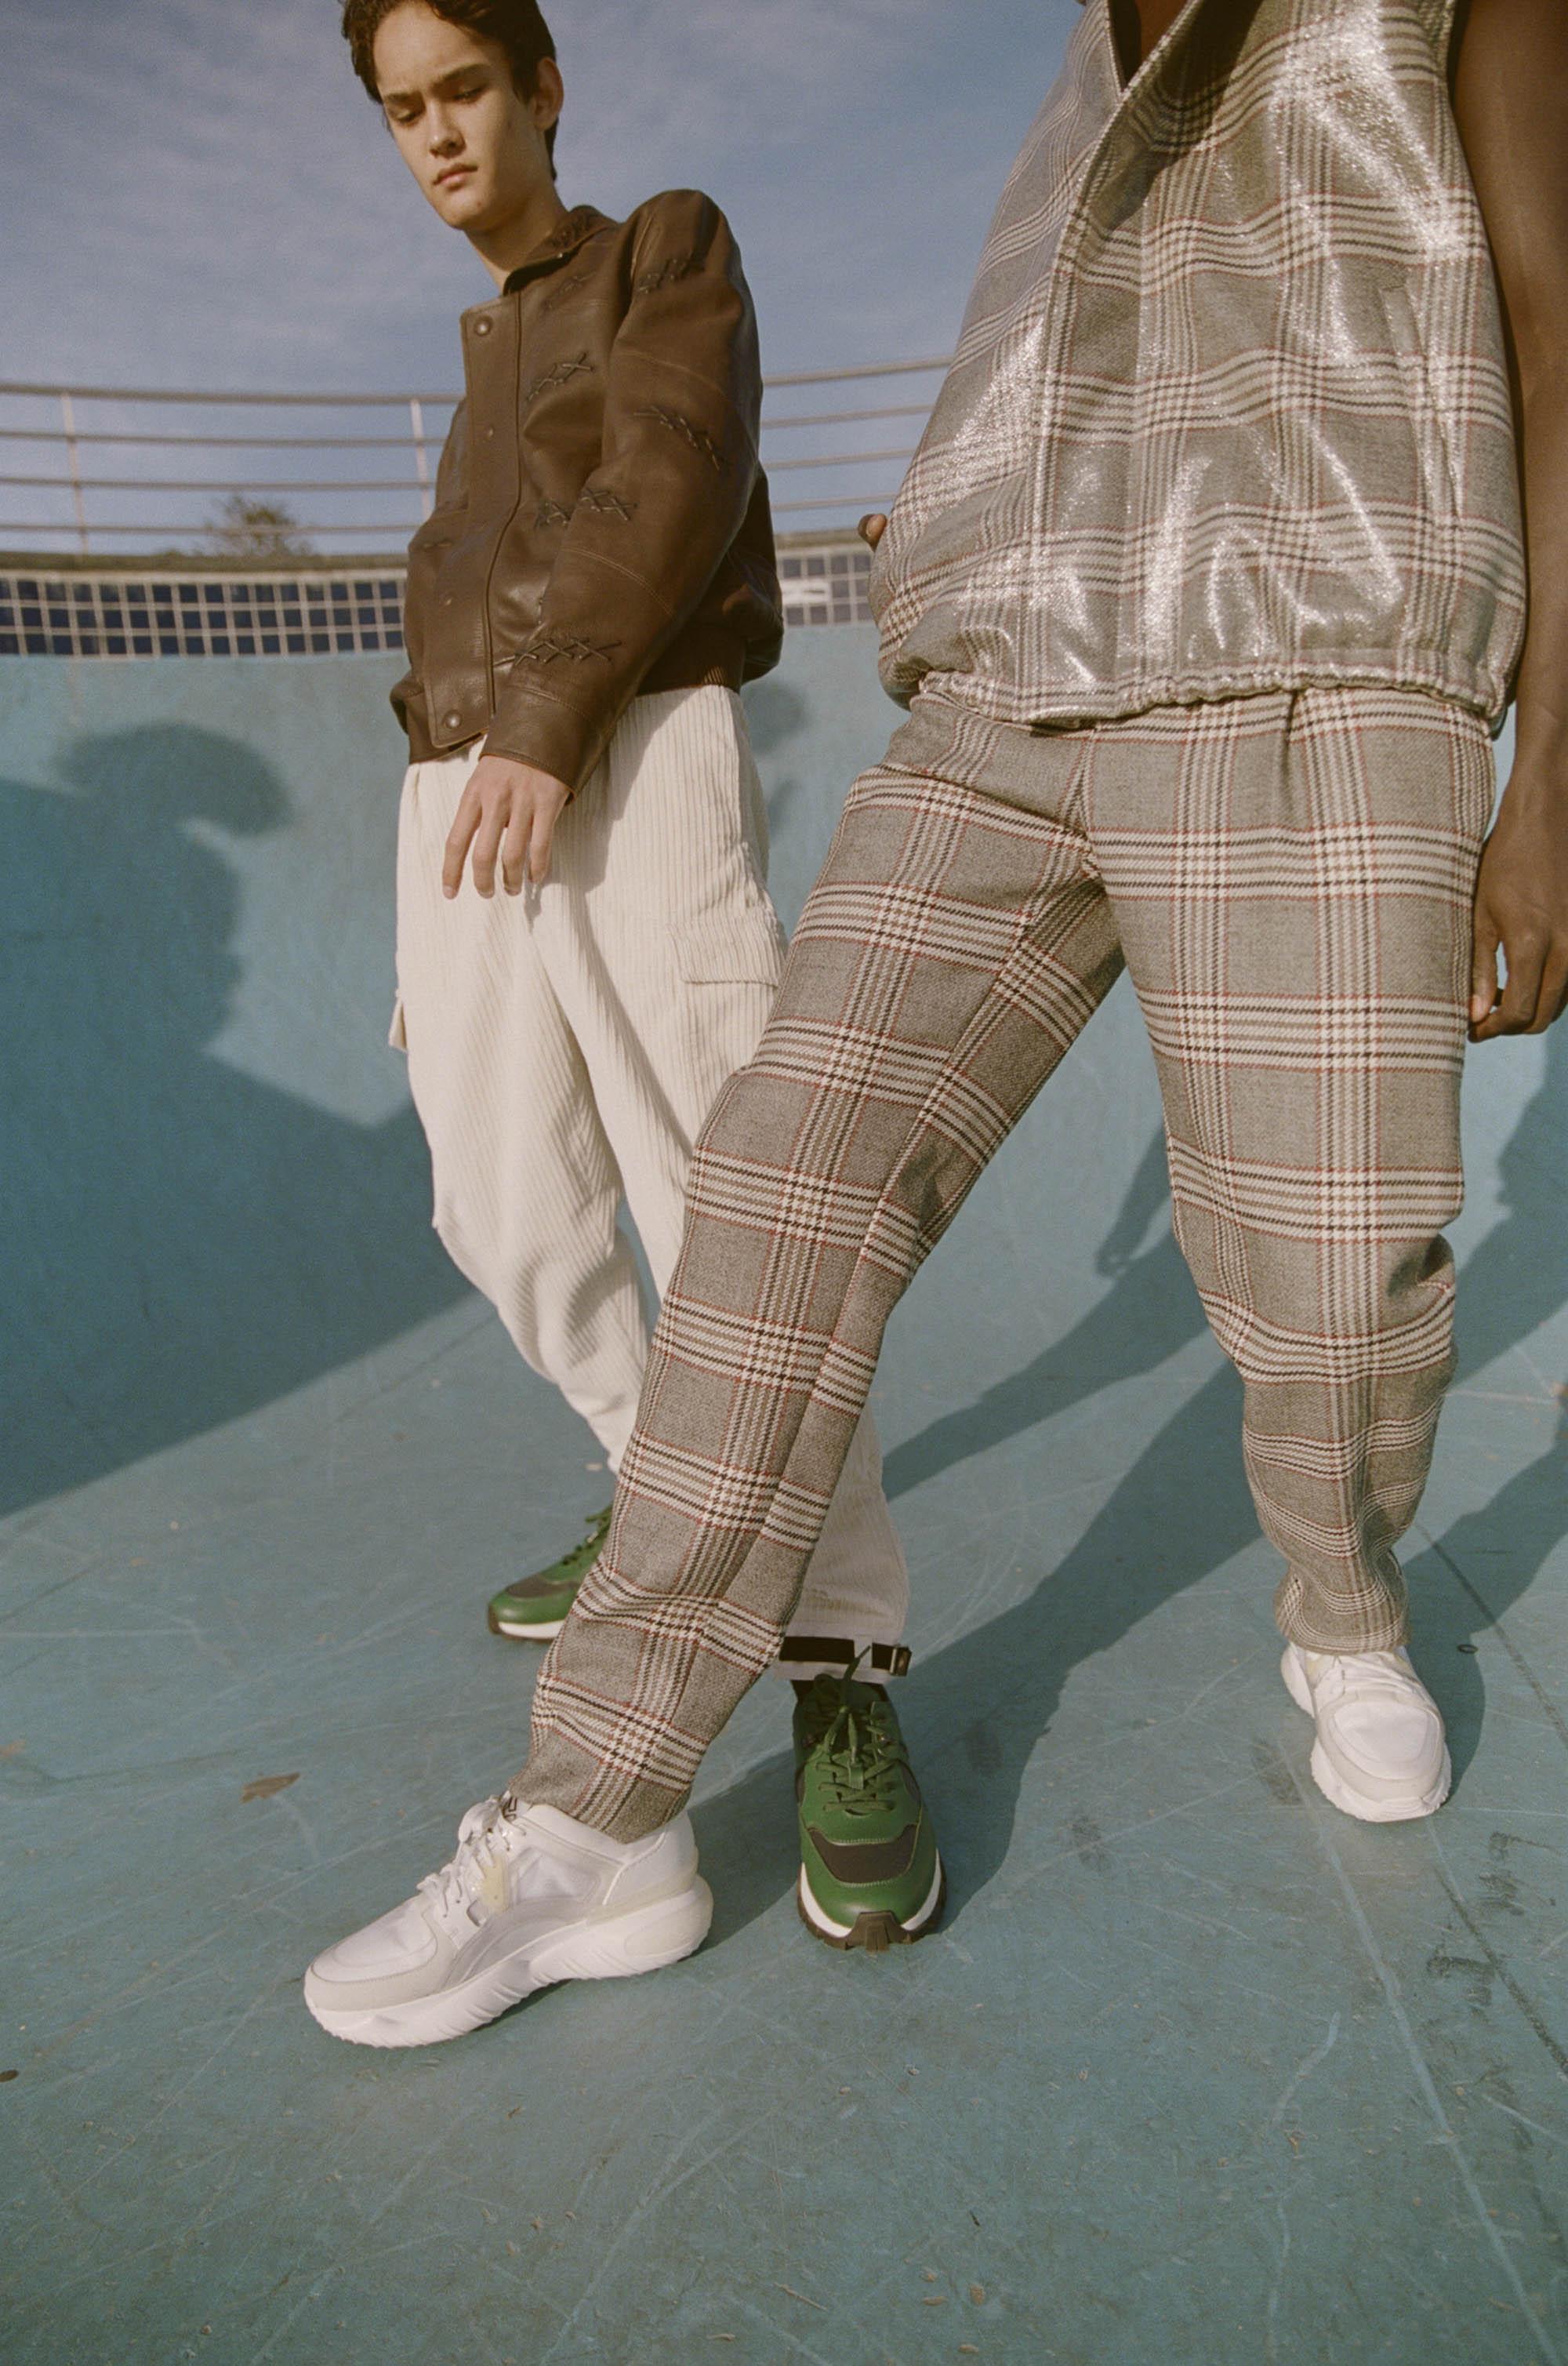 DAPHNENGUYEN-CPC Sneakers-181113000231850014.jpg